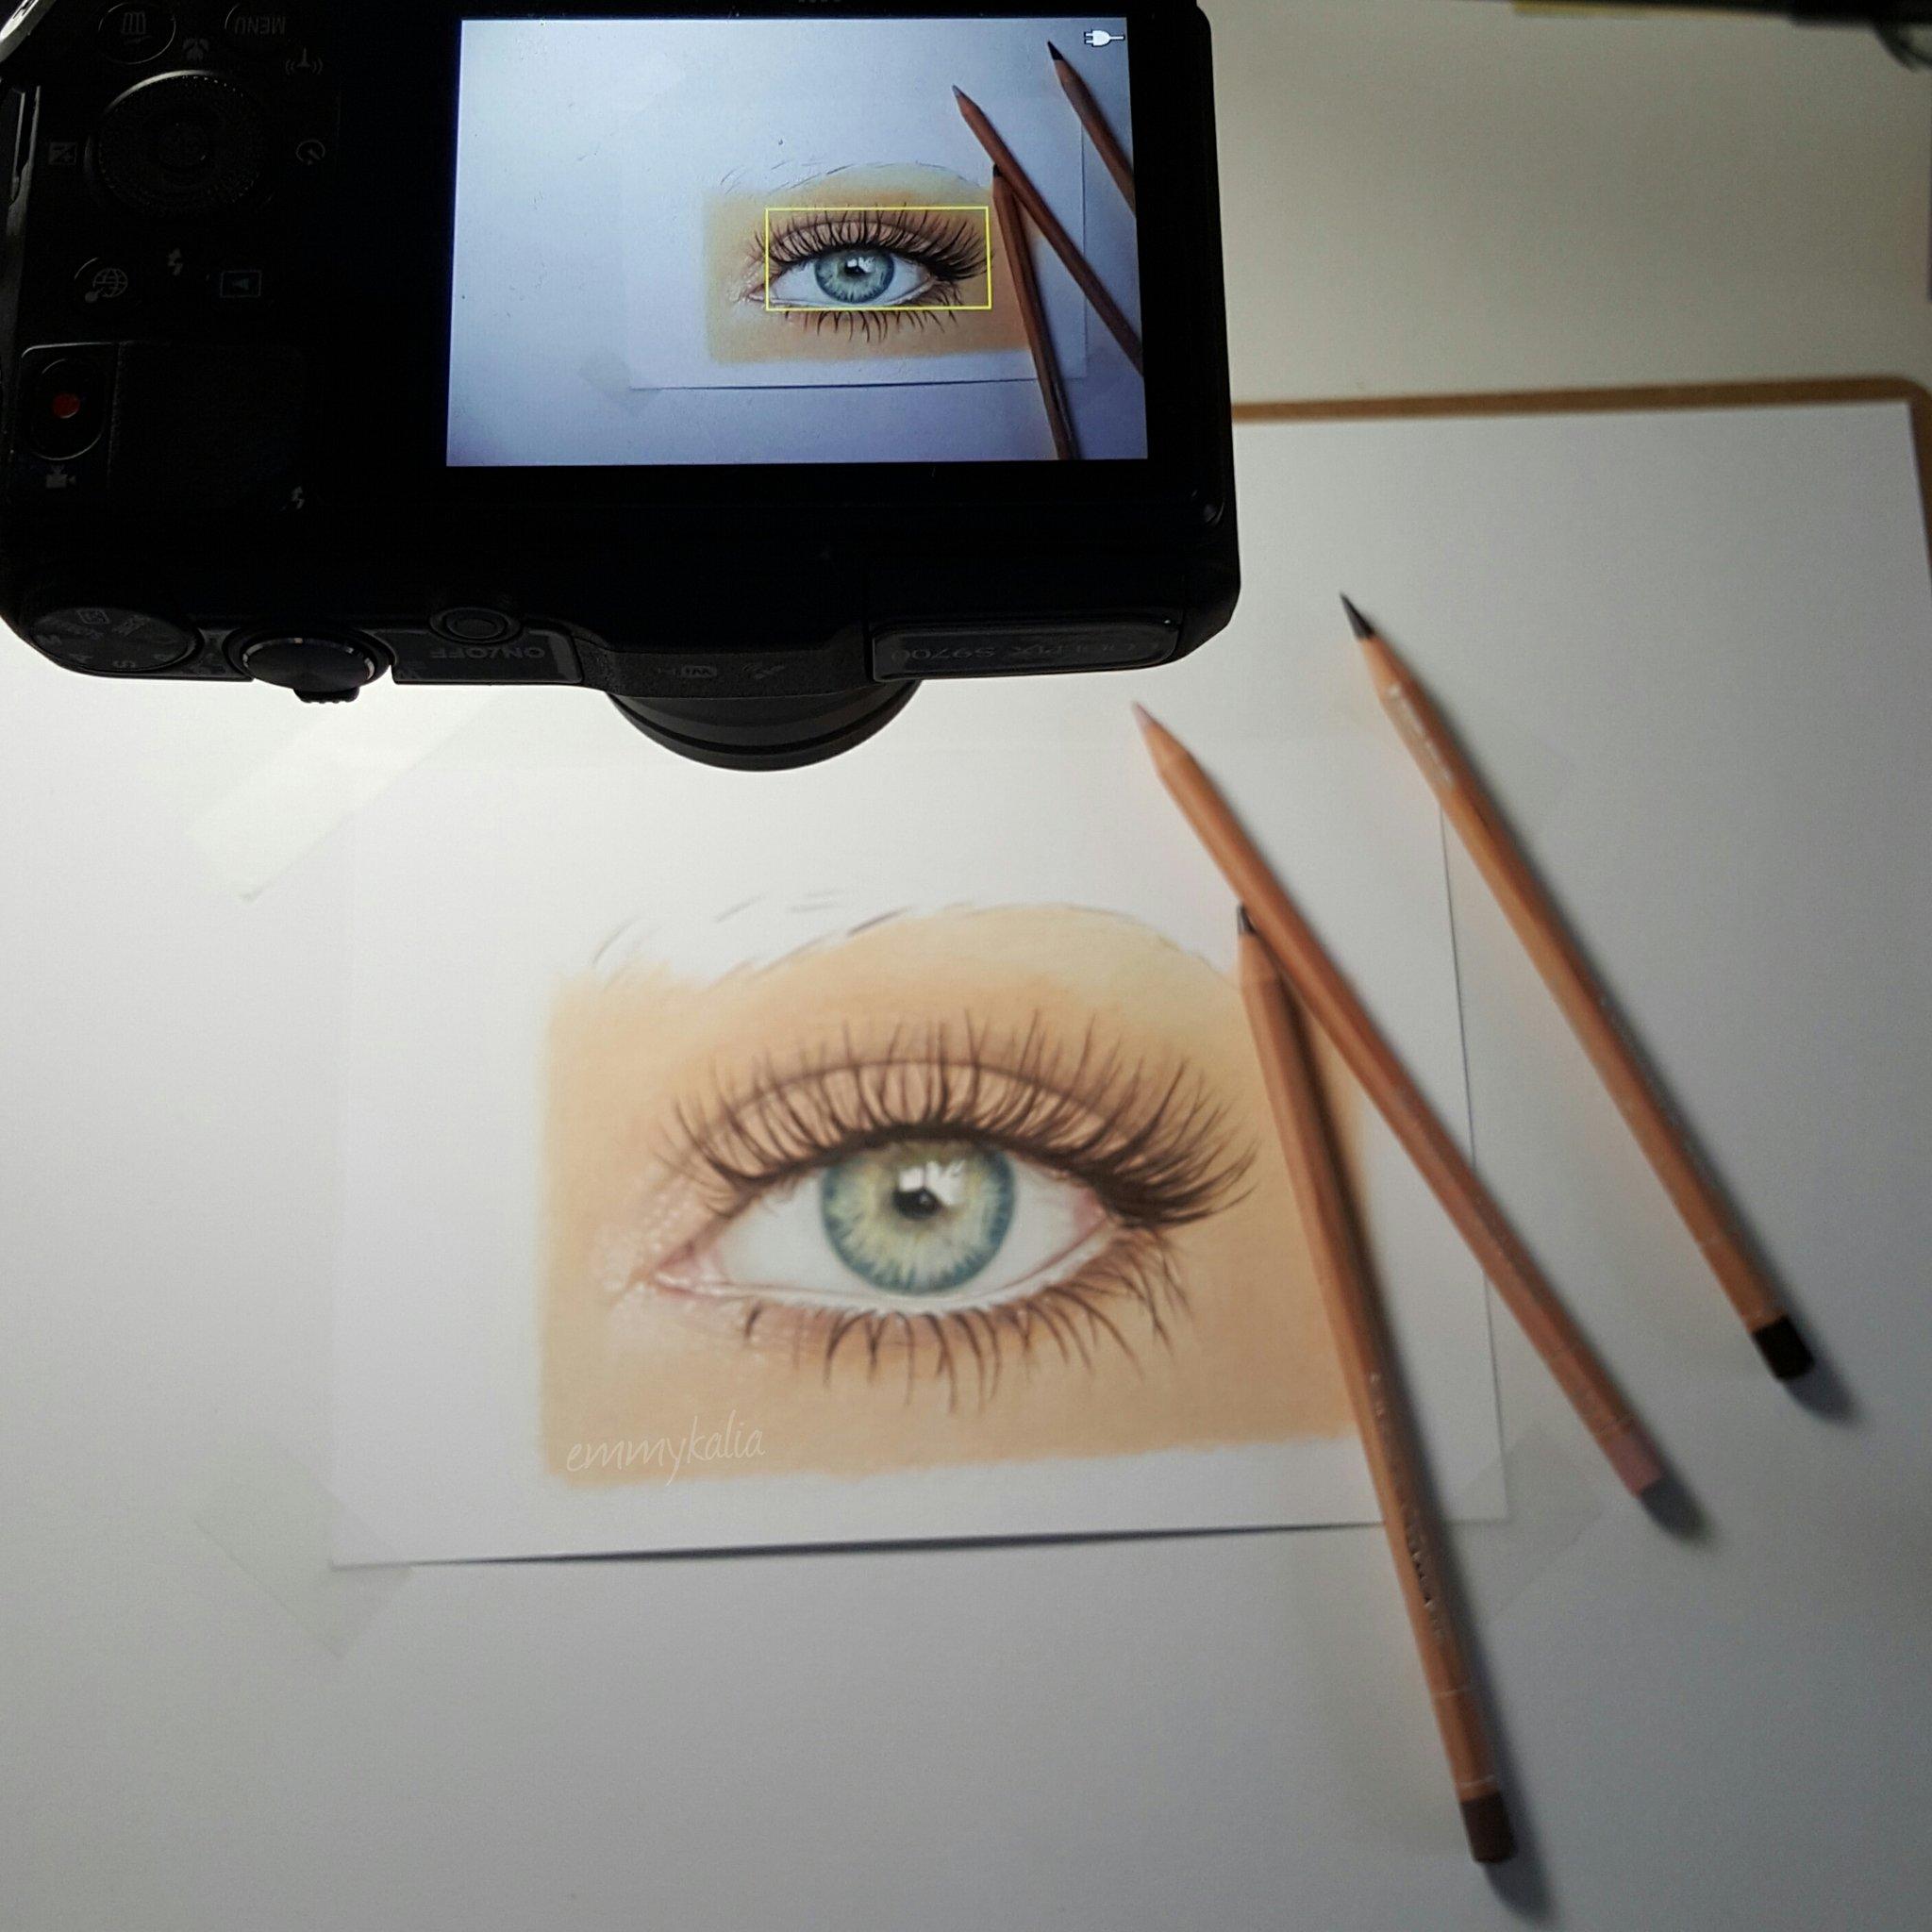 "Emmy Kalia on Twitter: ""Filming my drawing process! # ... Emmy Kalia"